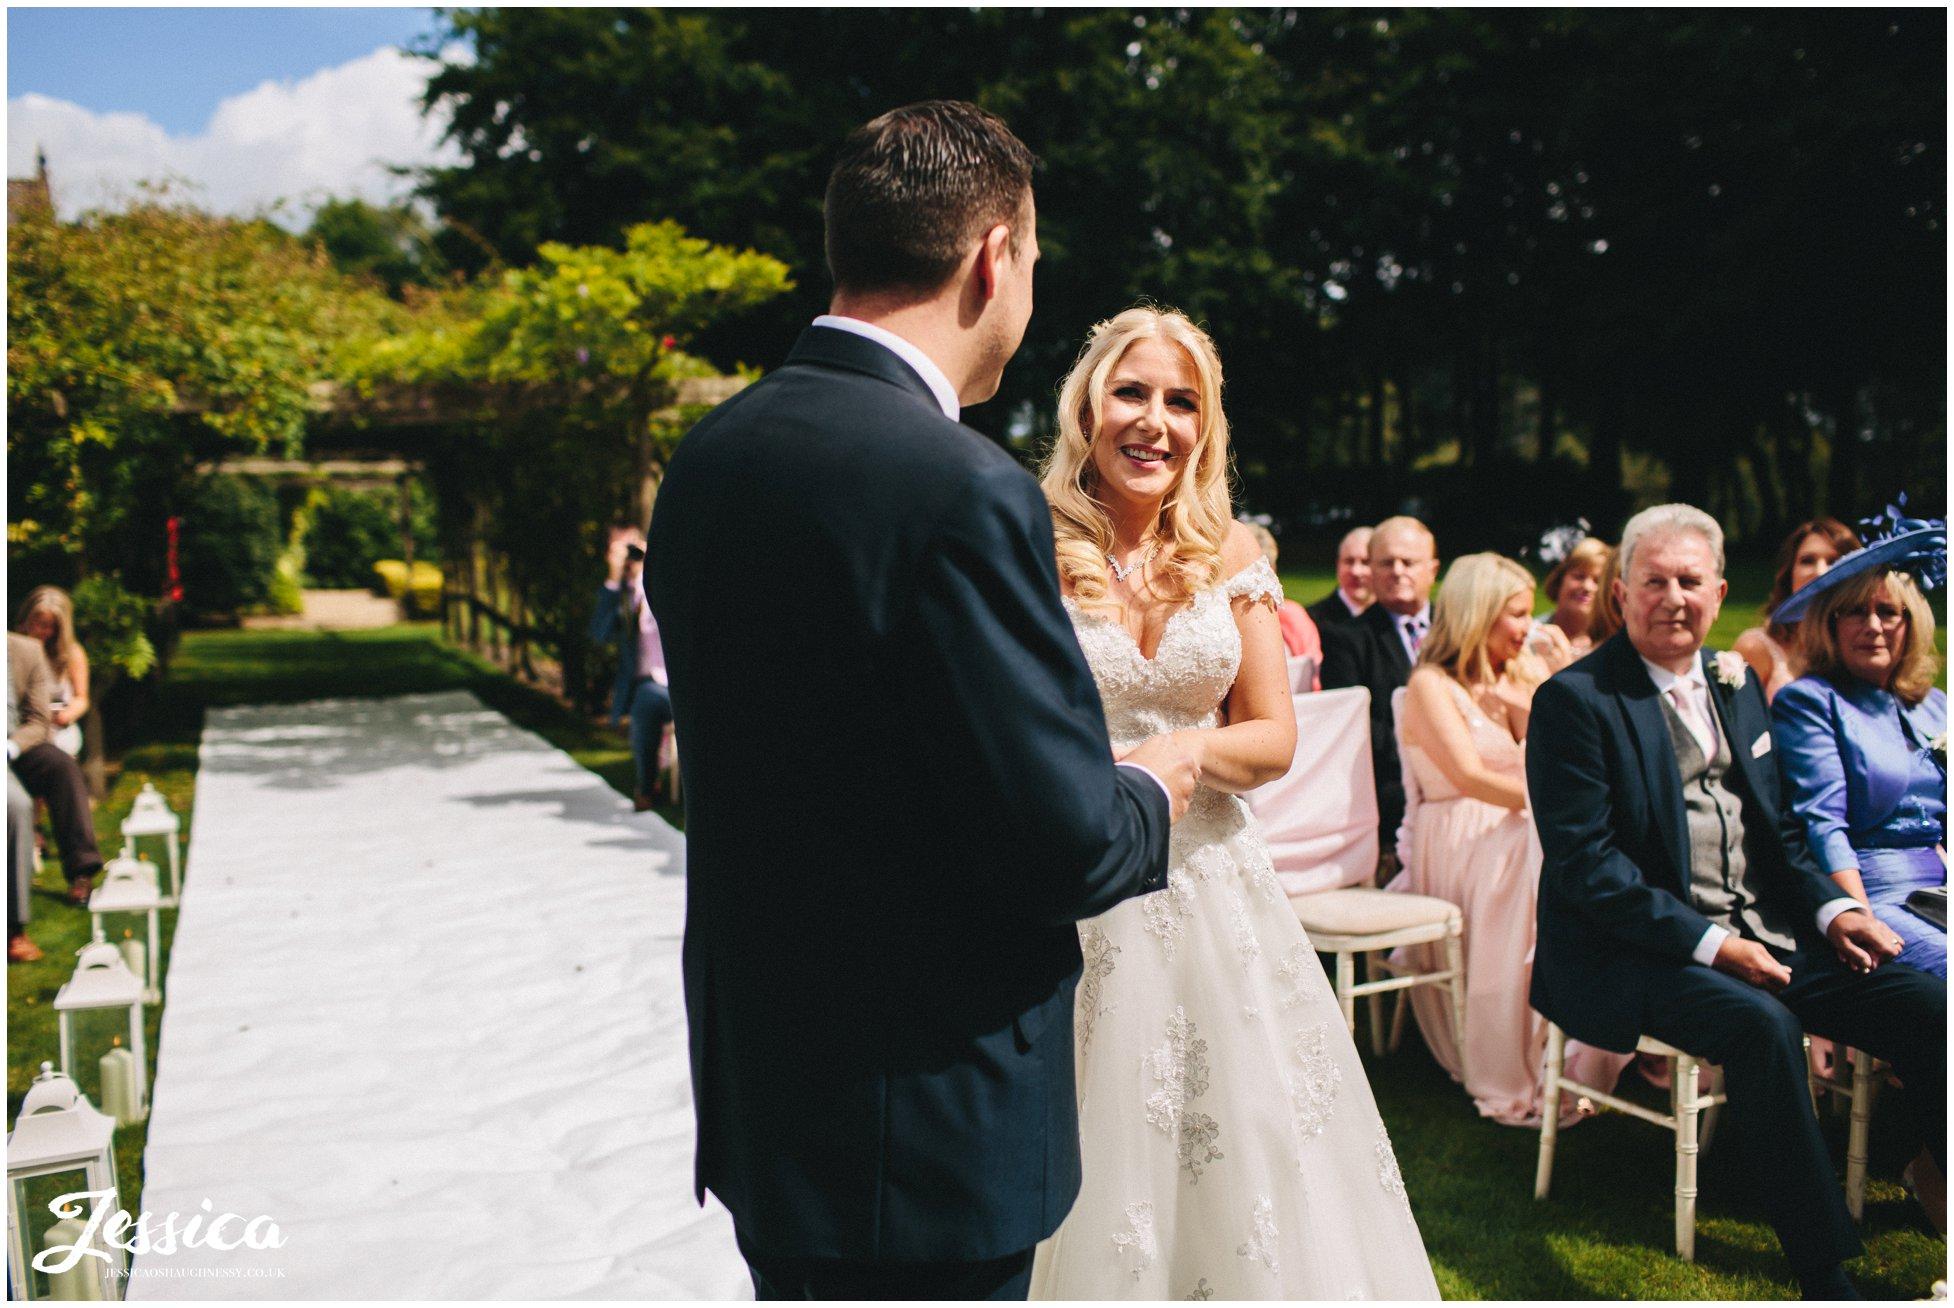 cheshire wedding photographer - bride & groom during wedding ceremony